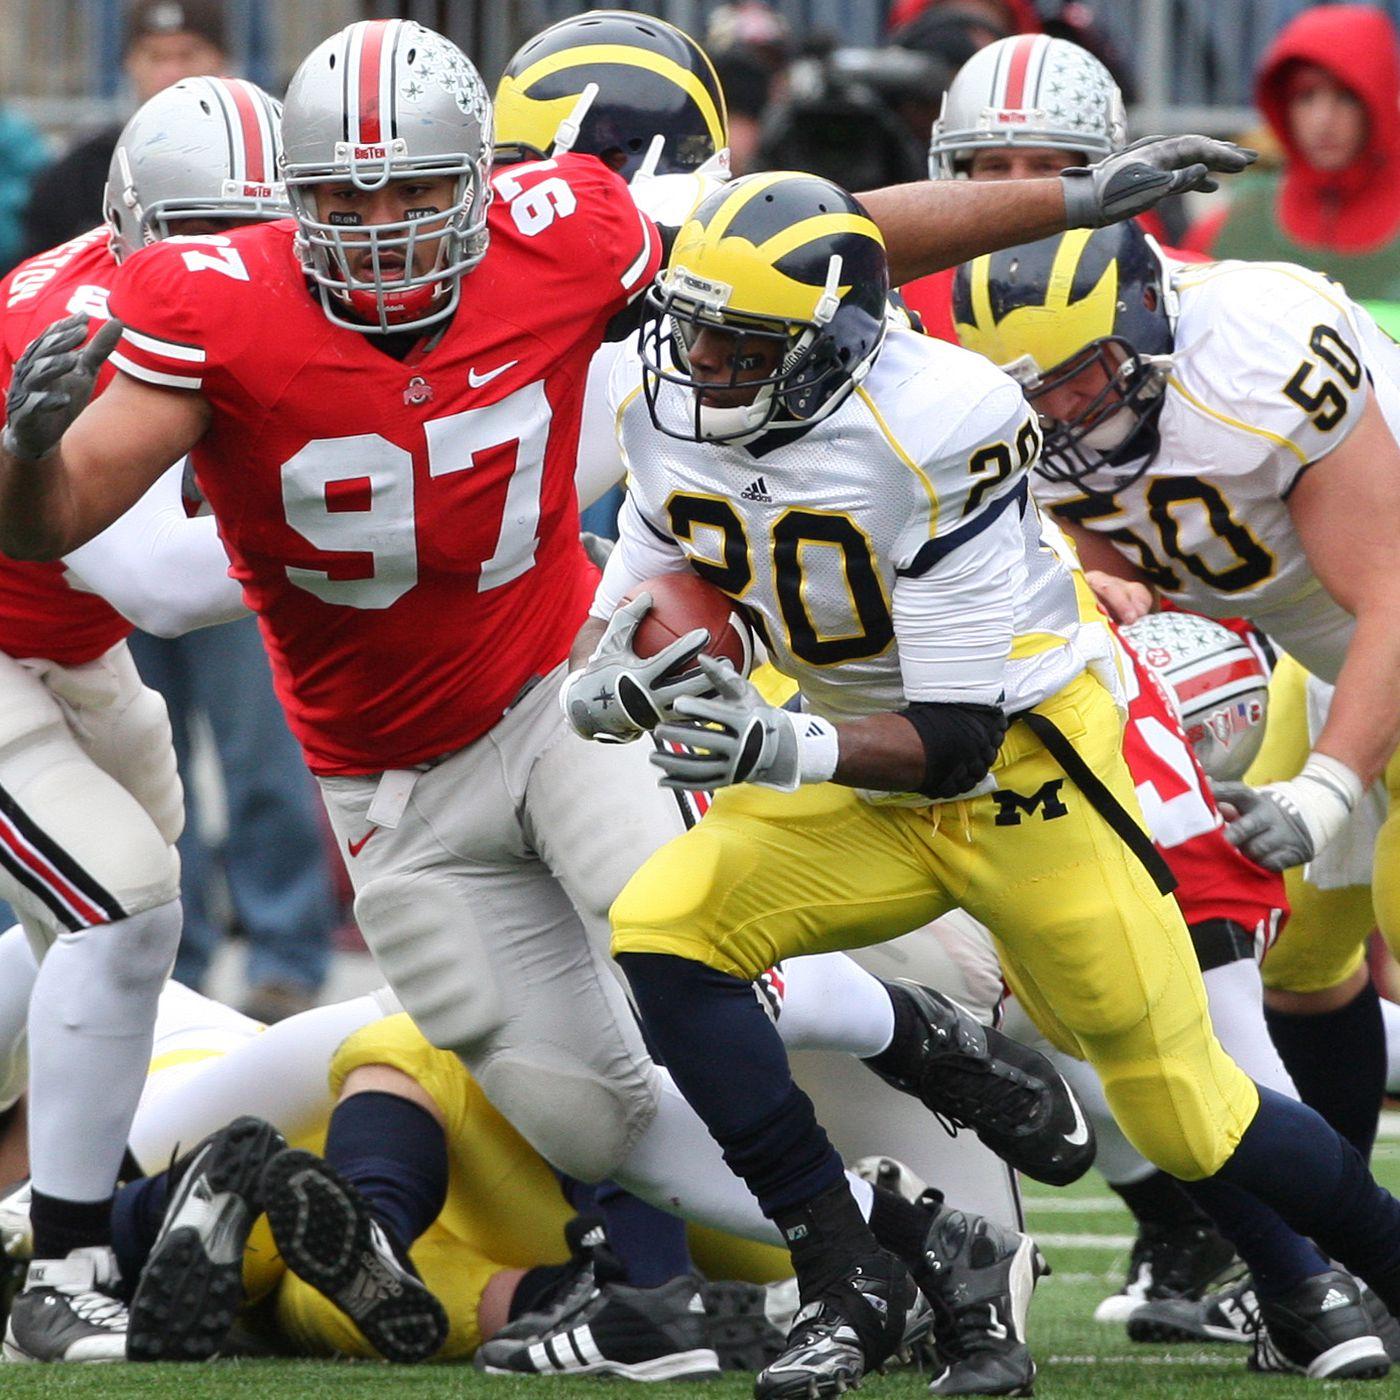 Cameron Heyward Ohio State Buckeyes Football Jersey - Red